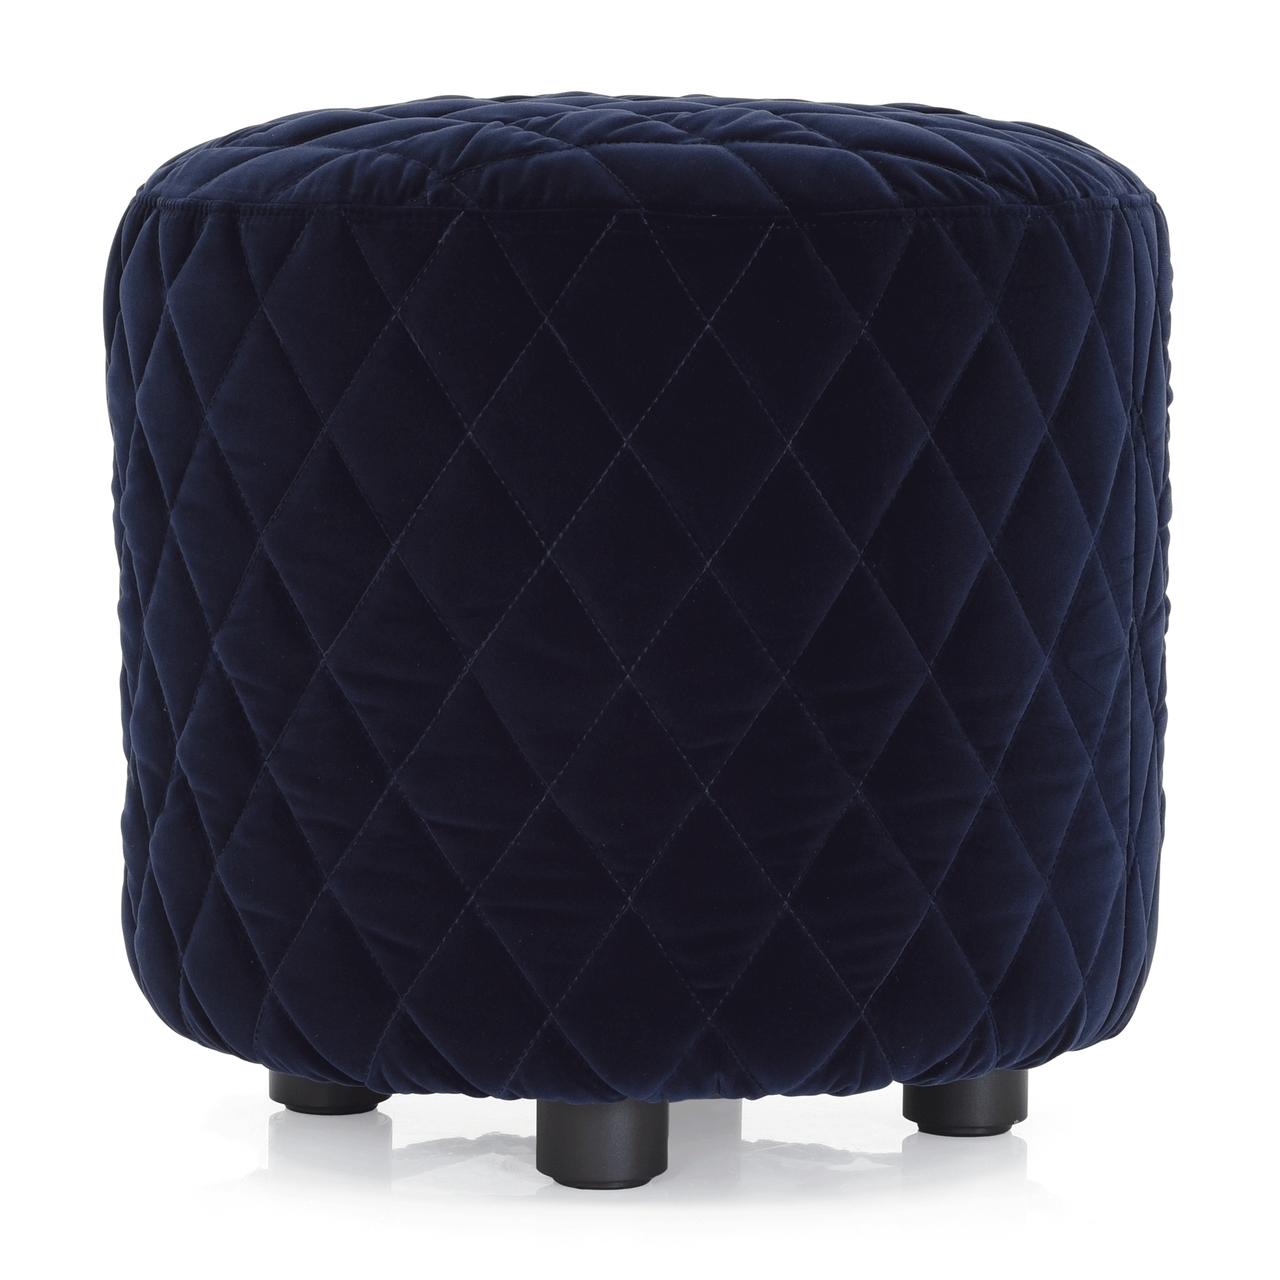 Melpot Quilted Ottoman Dark Blue Fabric Cantoni Cantoni